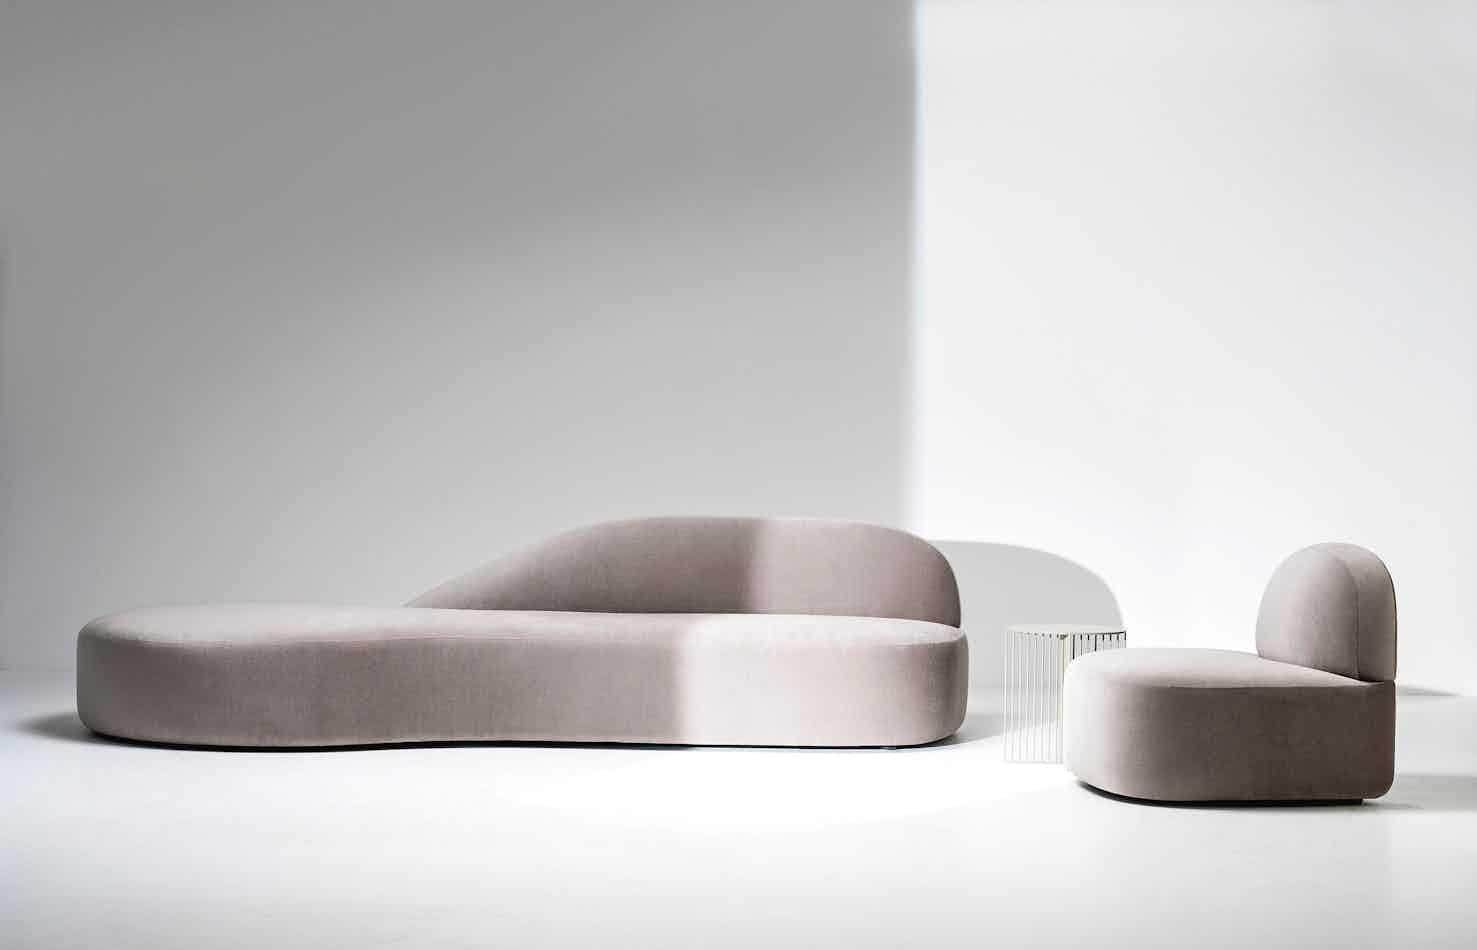 Lacividina-guest-armchair-with-sofa-haute-living